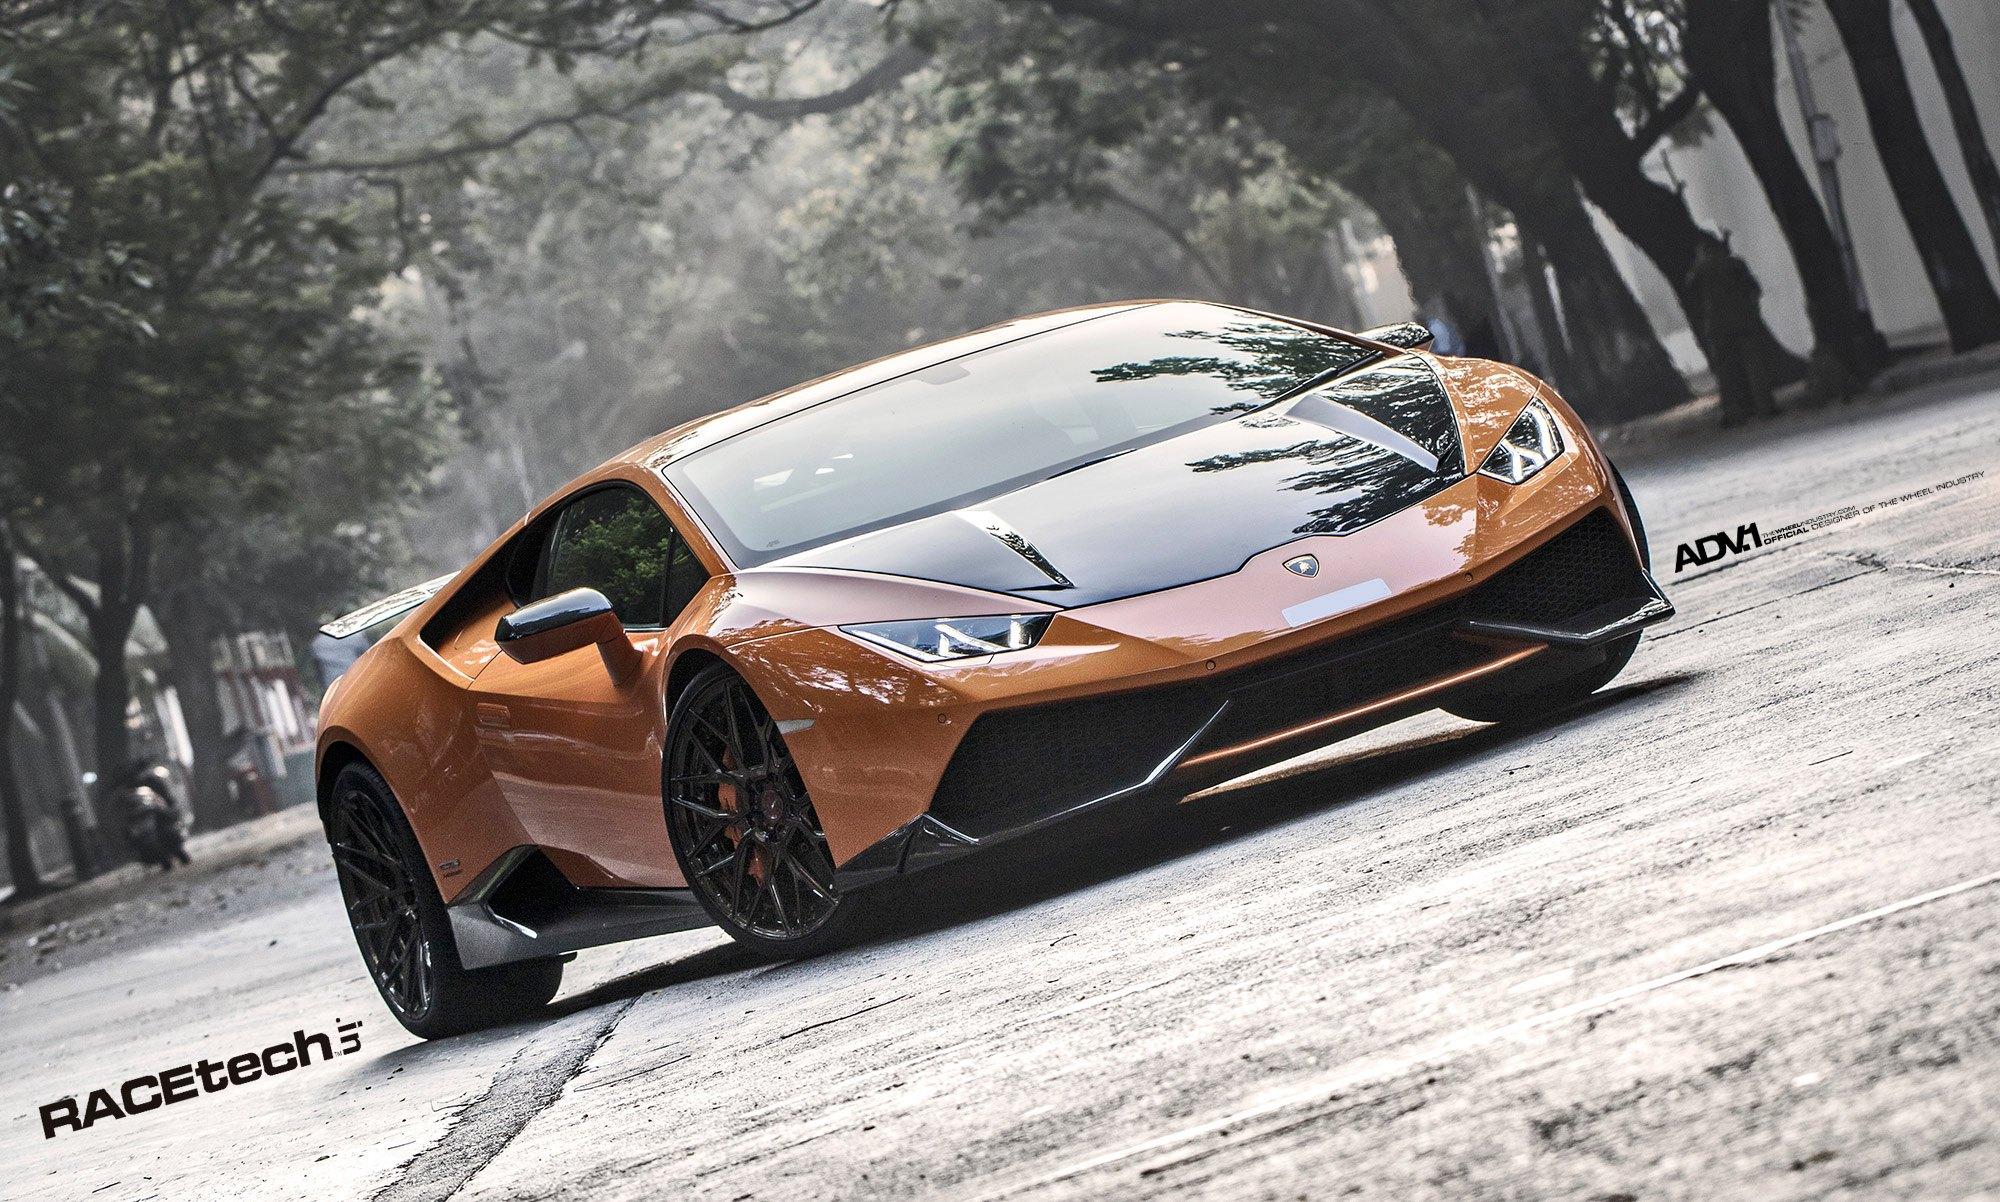 Orange Fighter Jet , Lamborghini Huracan by ADV1 \u2014 CARiD.com